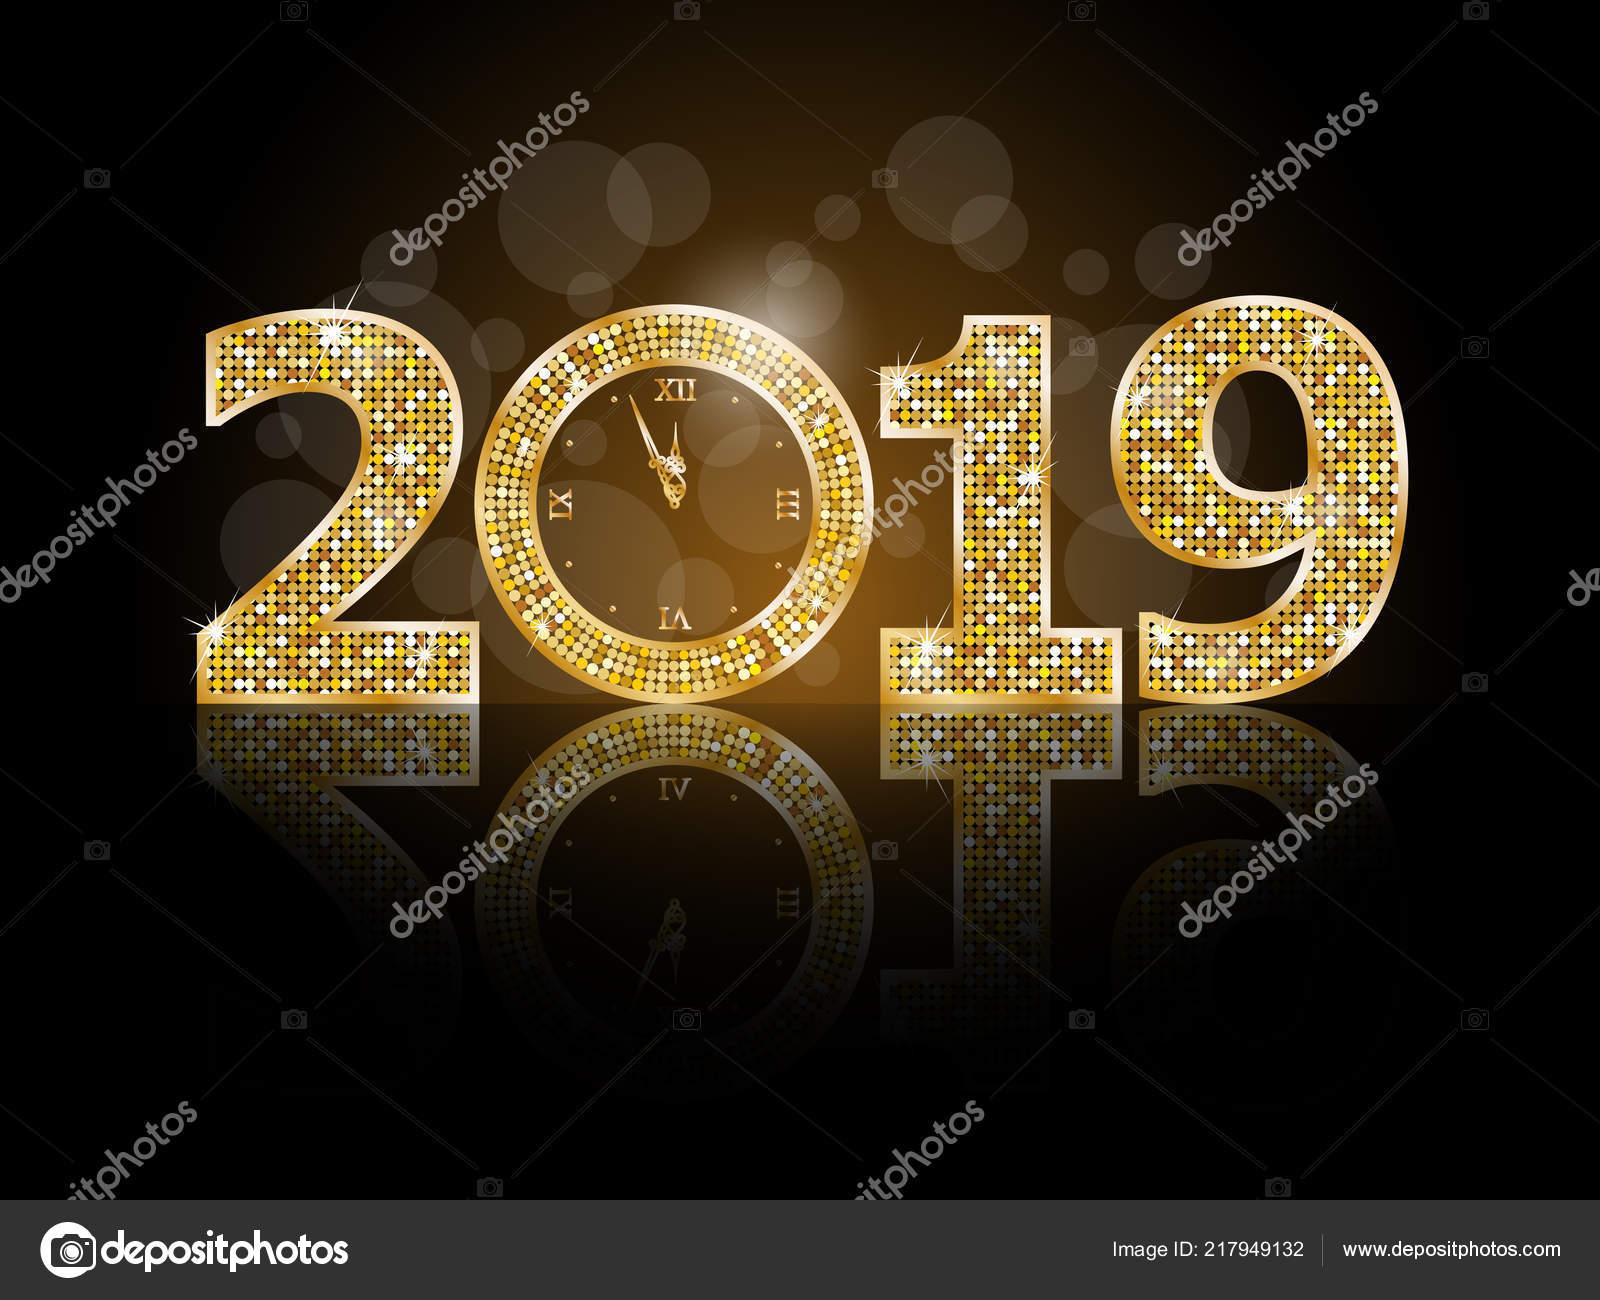 Happy New Year 2019 Stock Vector Image by ©Ferdiperdozniy #217949132